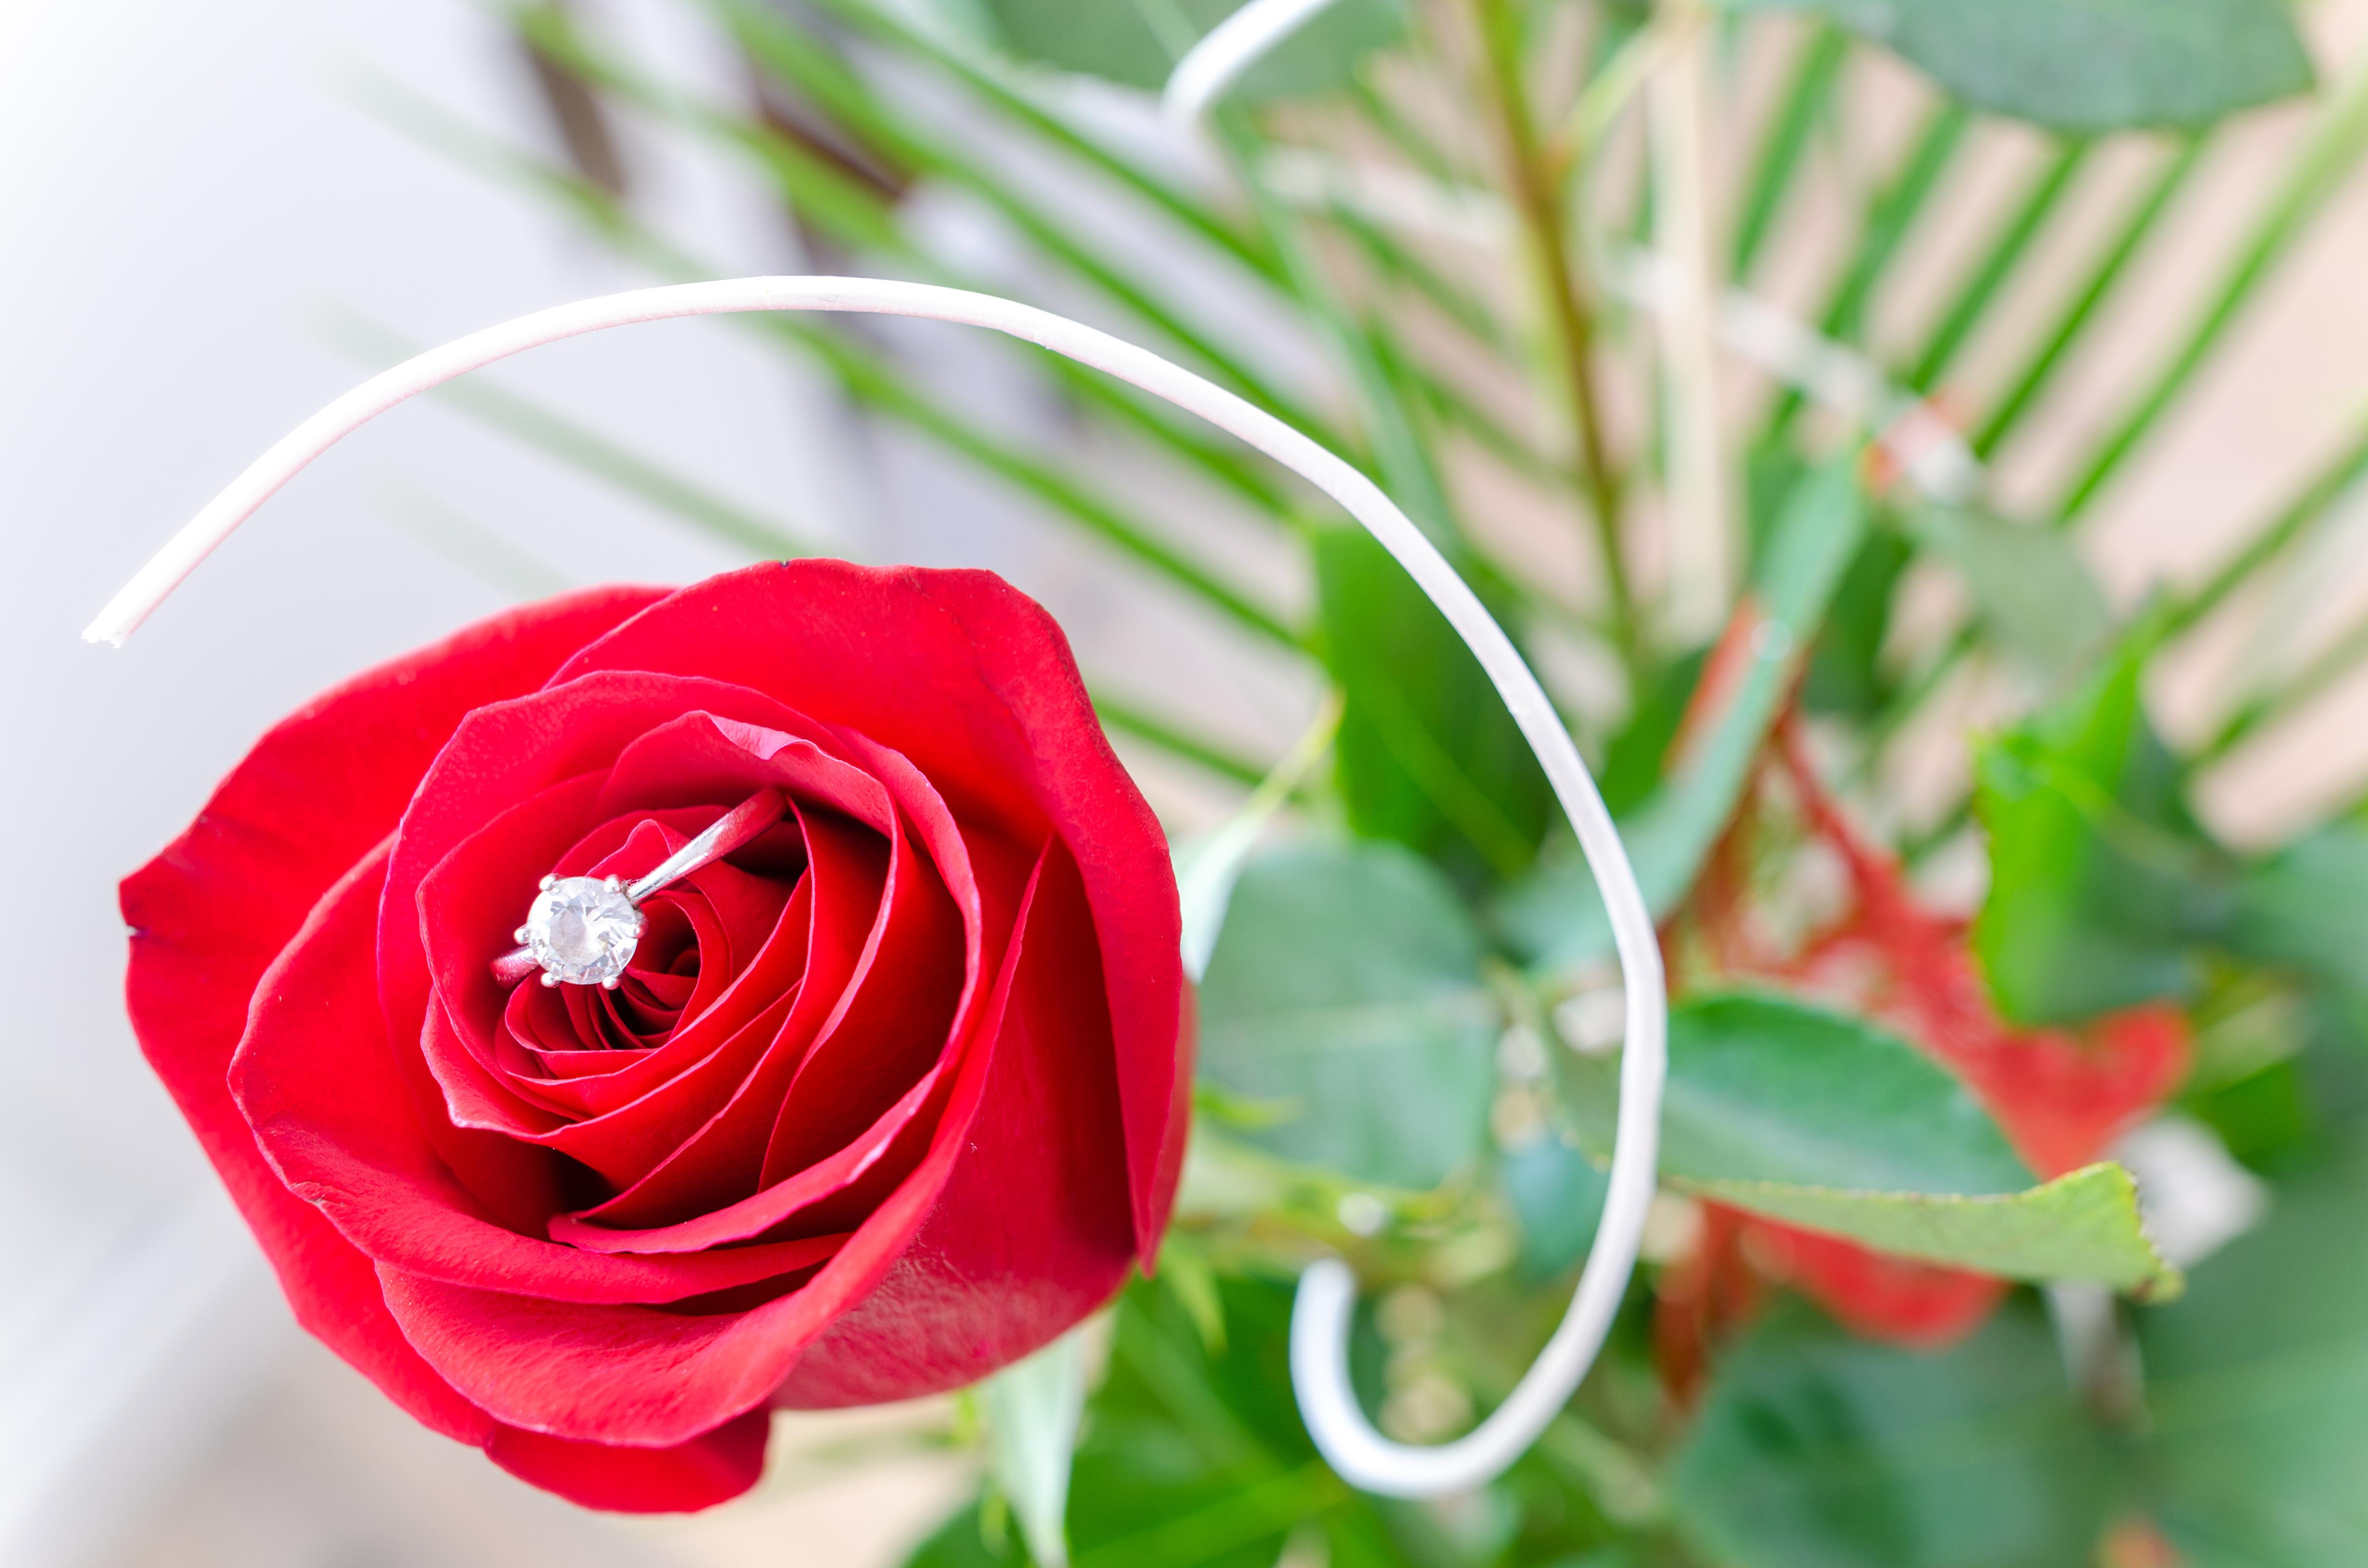 flower-rose-macro-nature-633859.jpeg (4928×3264)